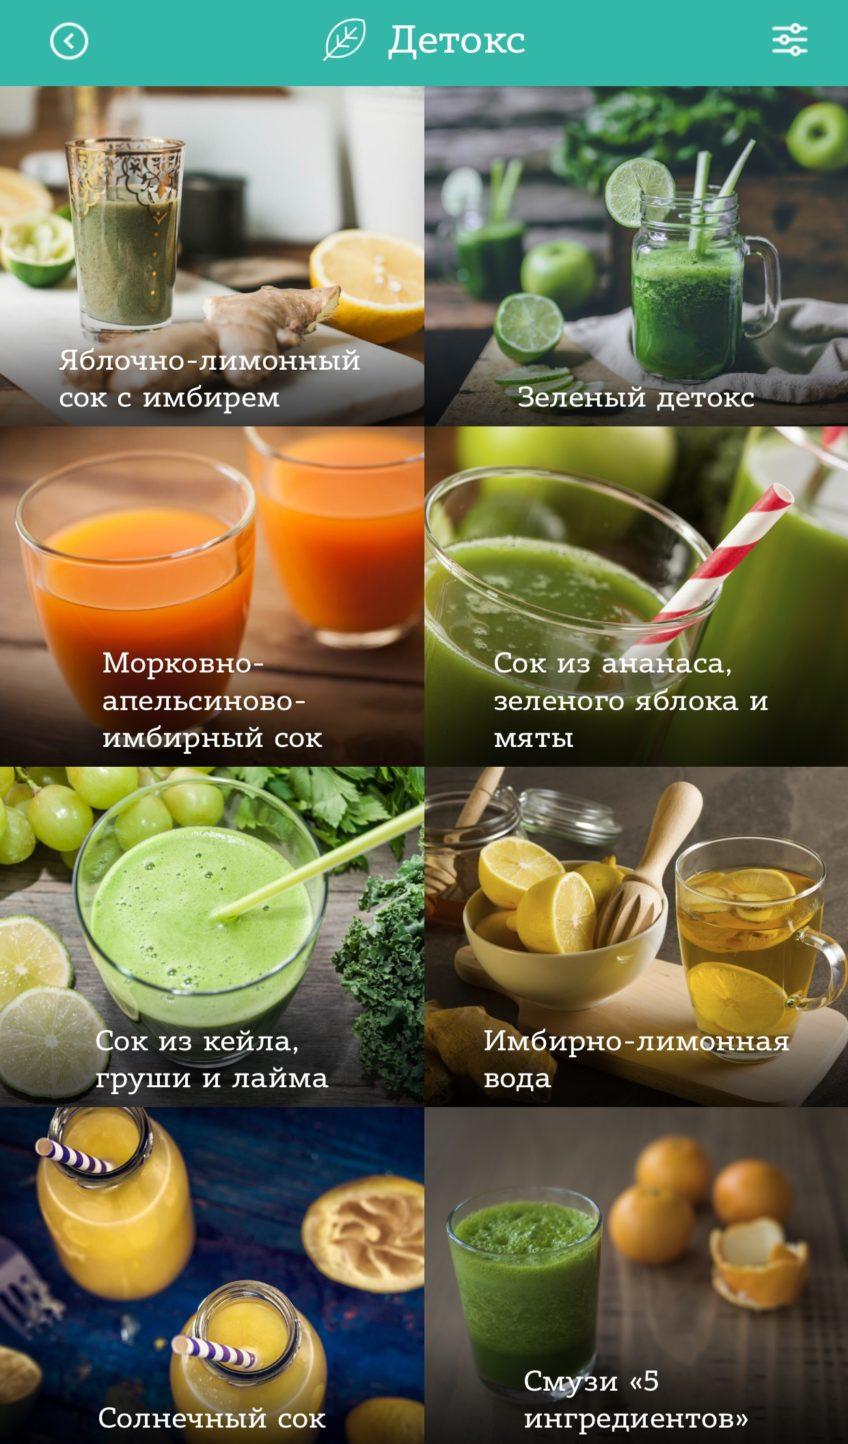 Детокс в домашних условиях рецепты